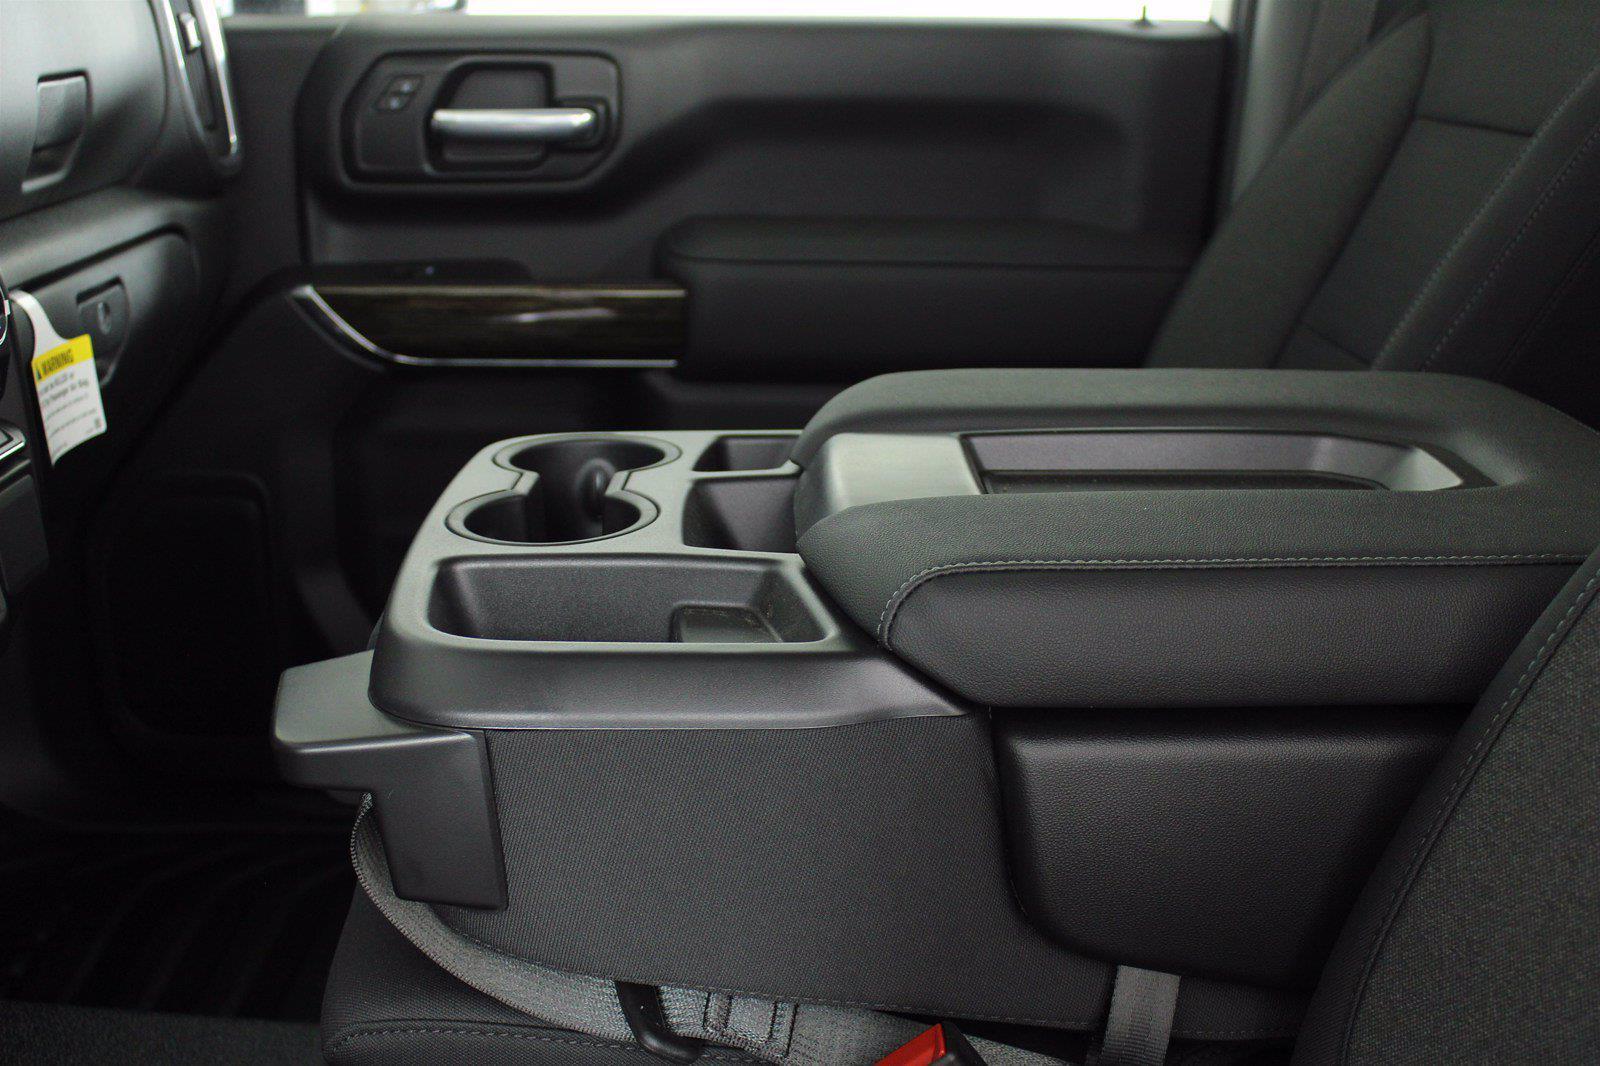 2022 Sierra 2500 Regular Cab 4x4,  Pickup #D420038 - photo 13